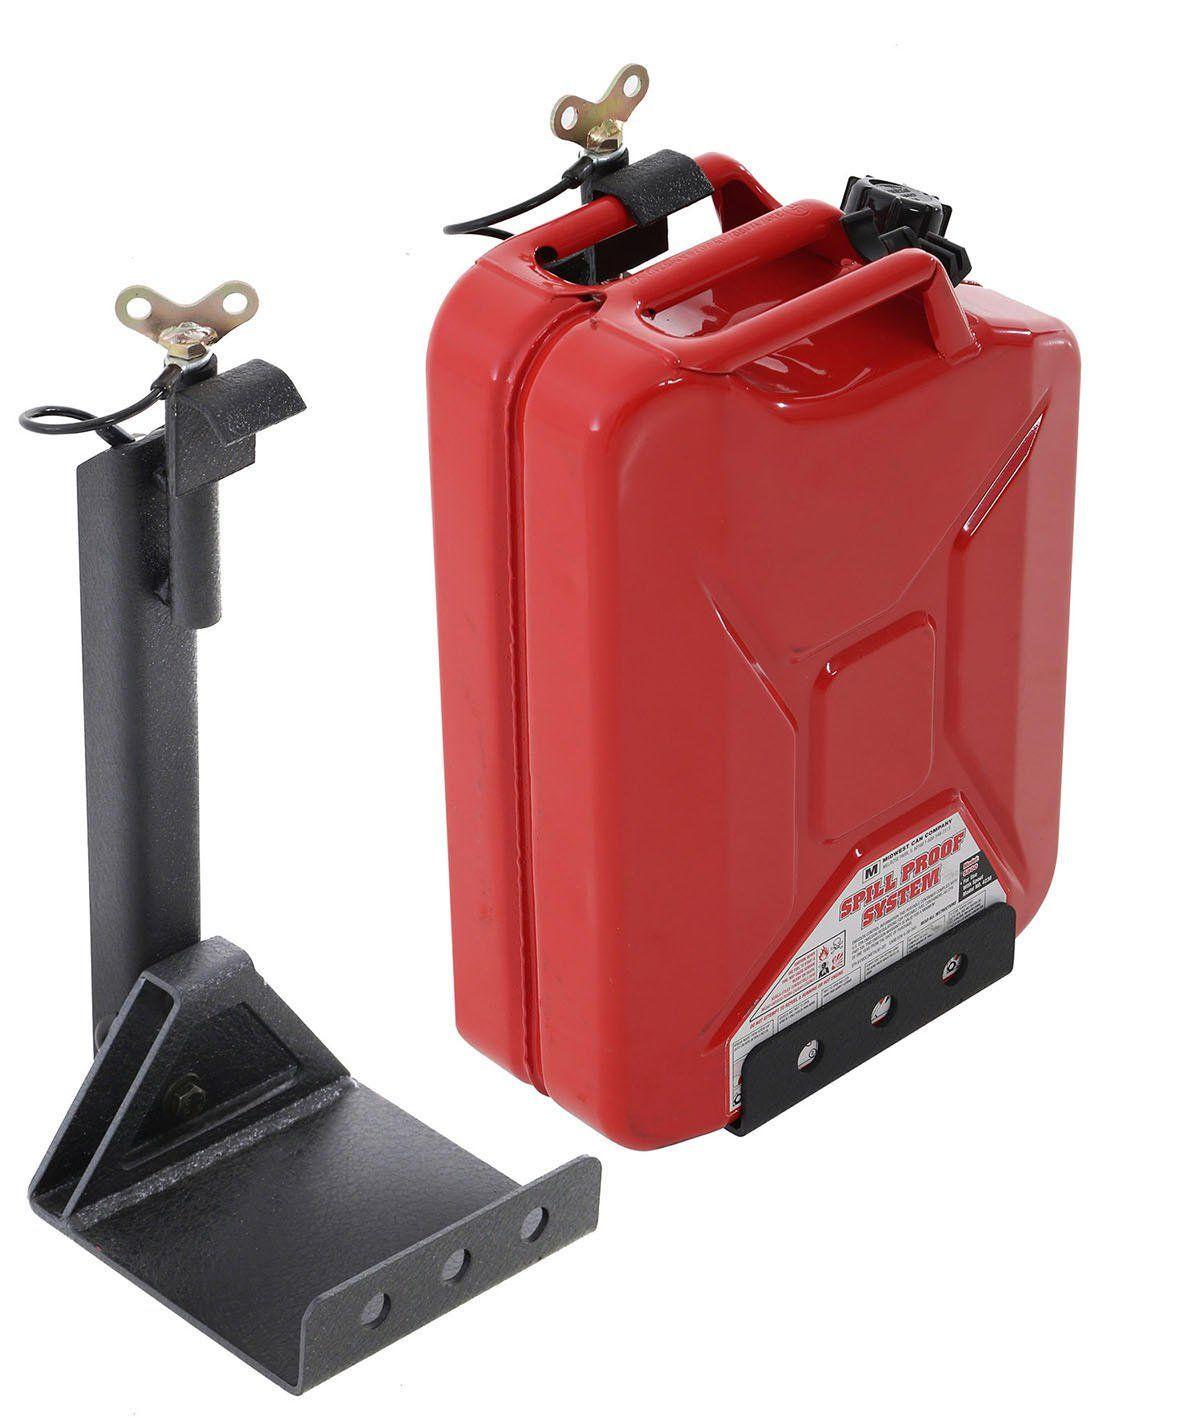 Smittybilt D8007 Heavy Duty Gas Can Mount For Smittybilt